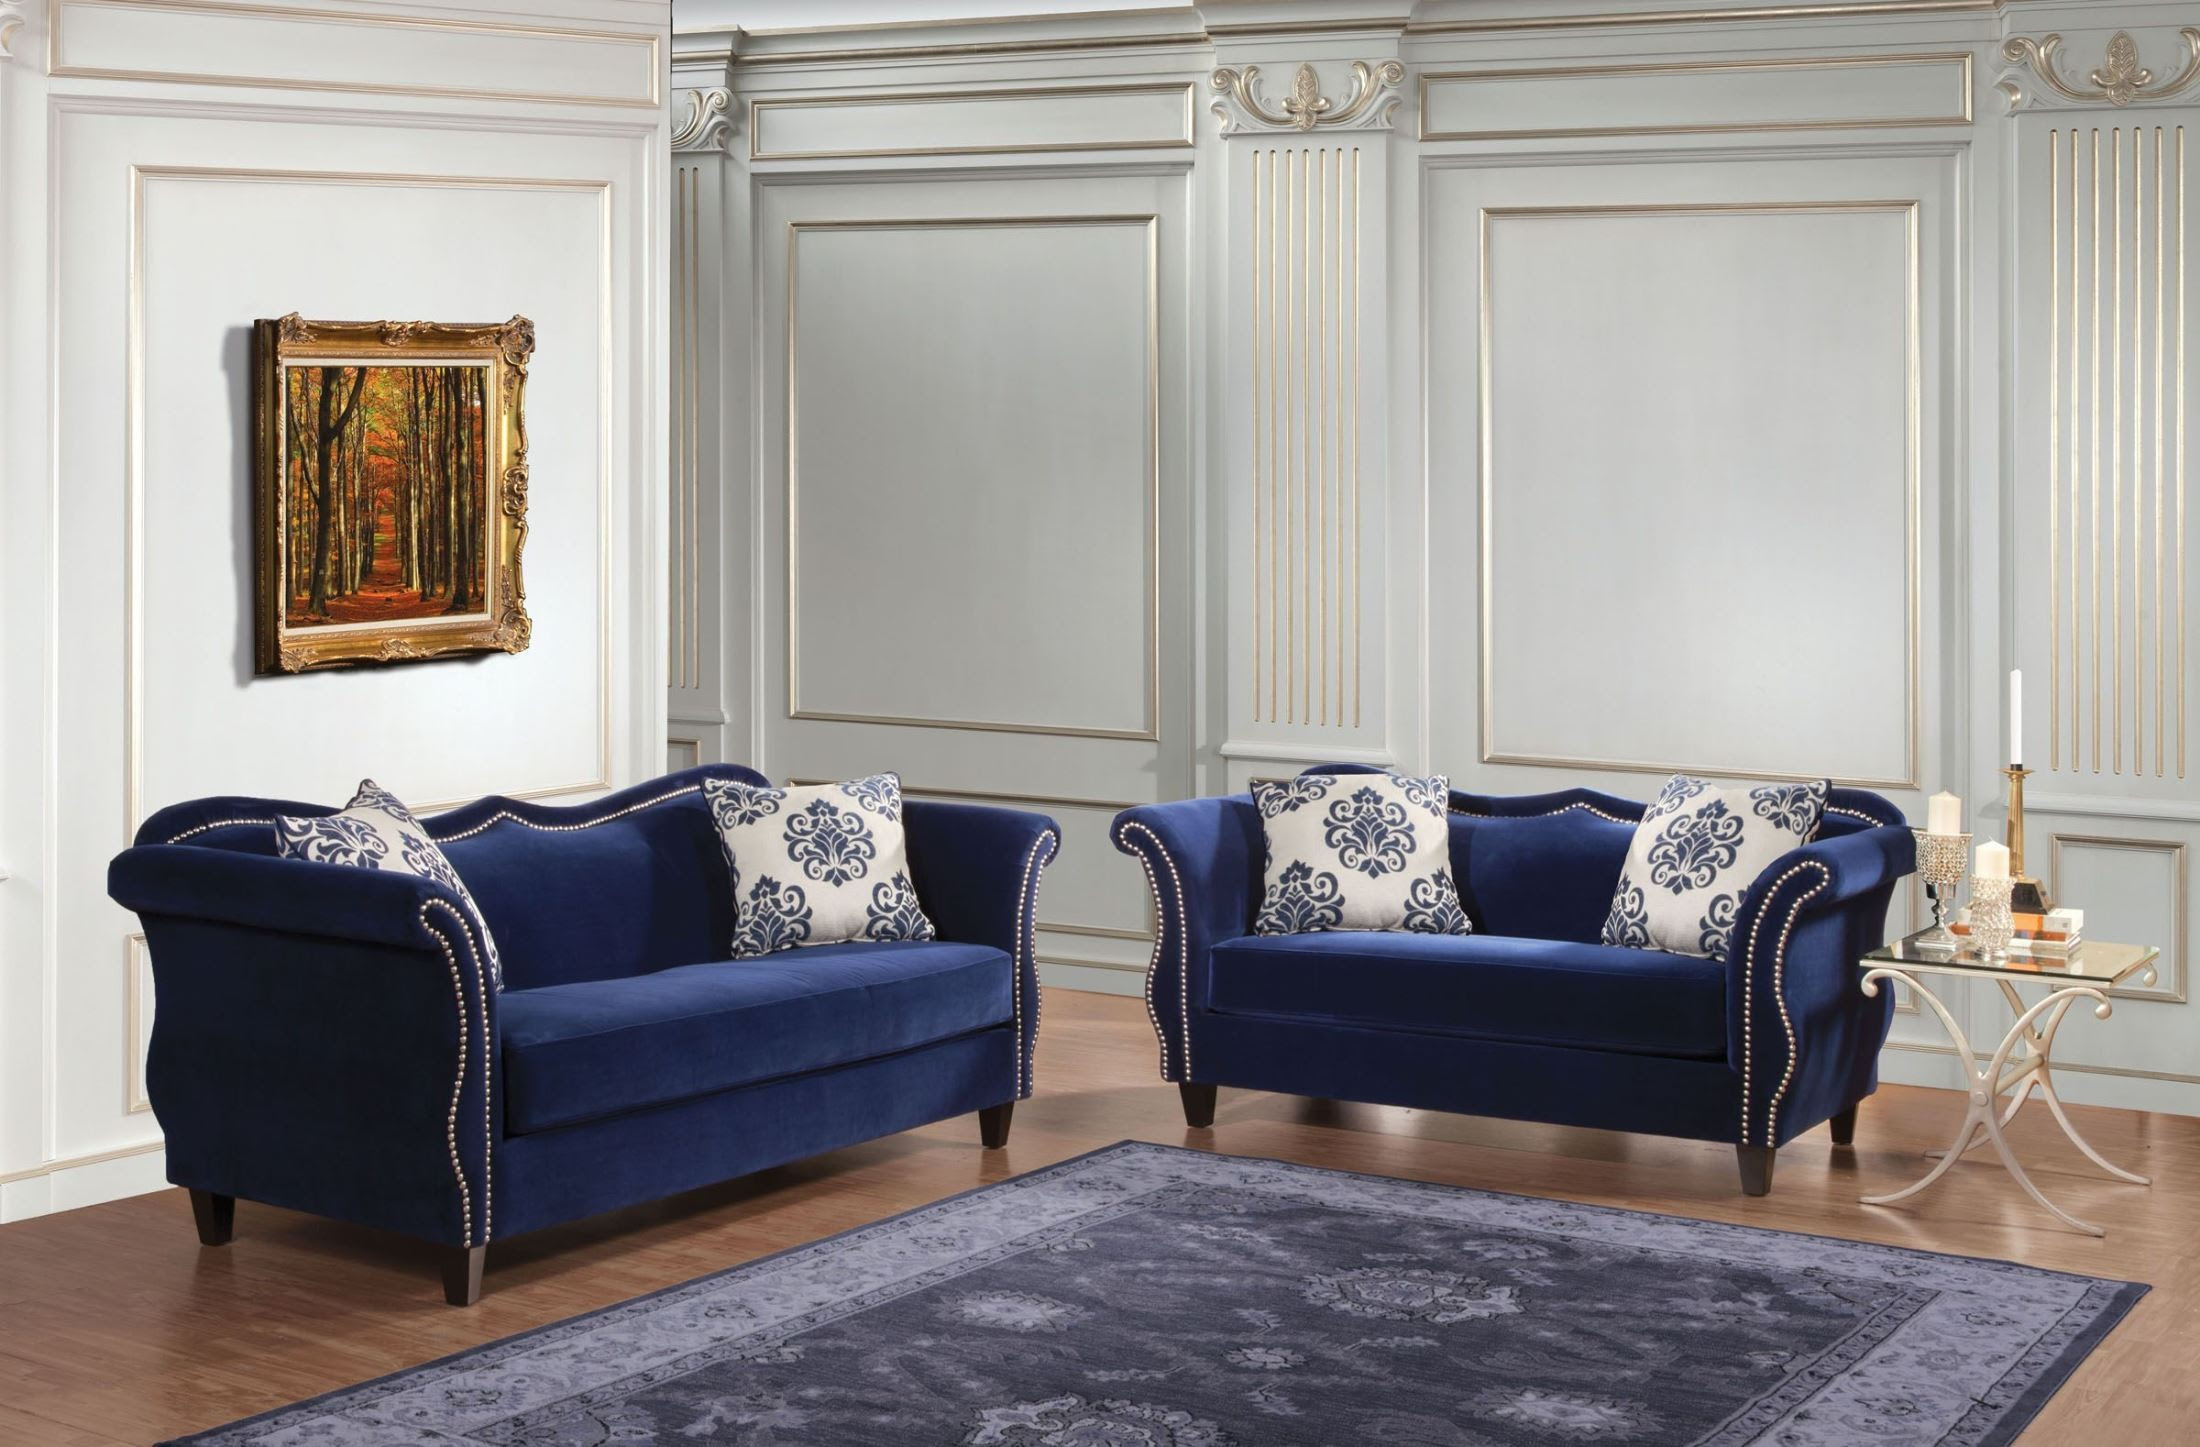 Zaffiro Royal Blue Living Room Set, SM2231-SF, Furniture ...